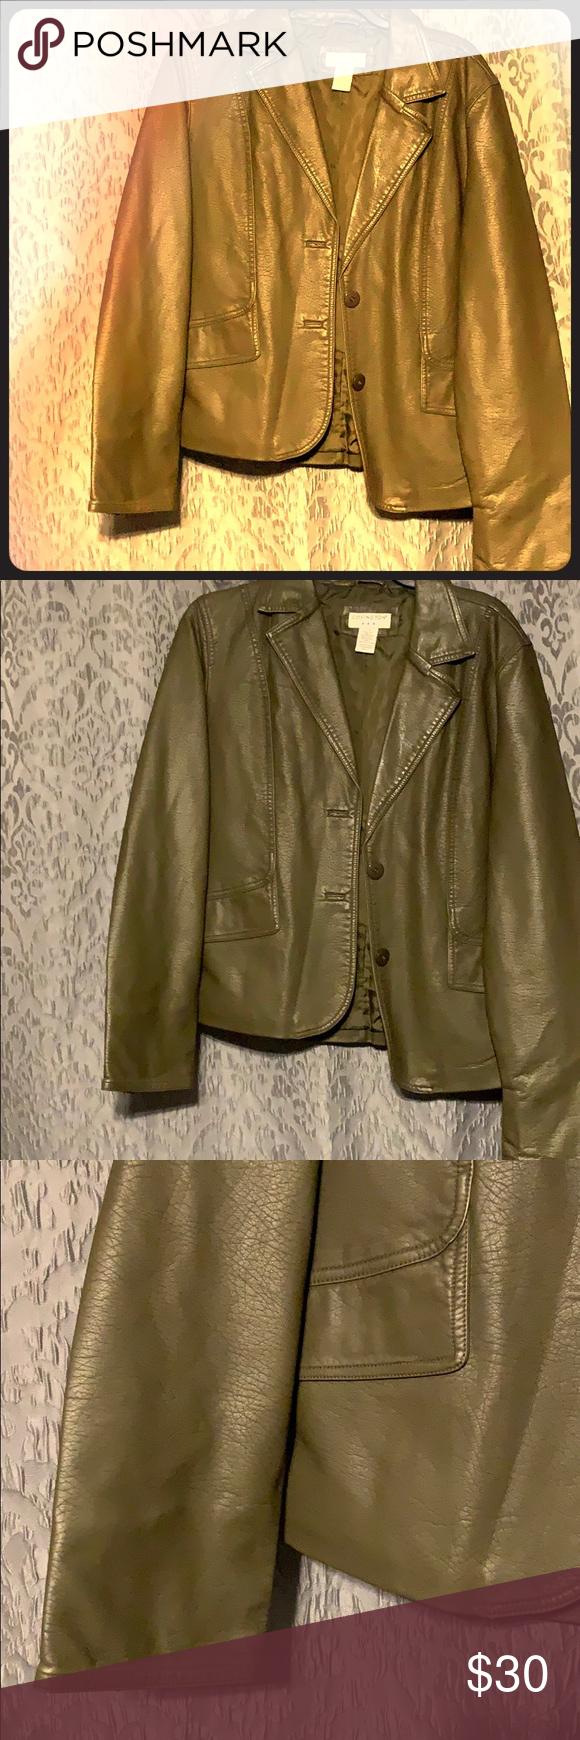 Covington Leather Jacket Covington Size Large Green Leather Jacket Perfect Condition Barely Worn Covington Jacke Green Leather Jackets Leather Jacket Jackets [ 1740 x 580 Pixel ]